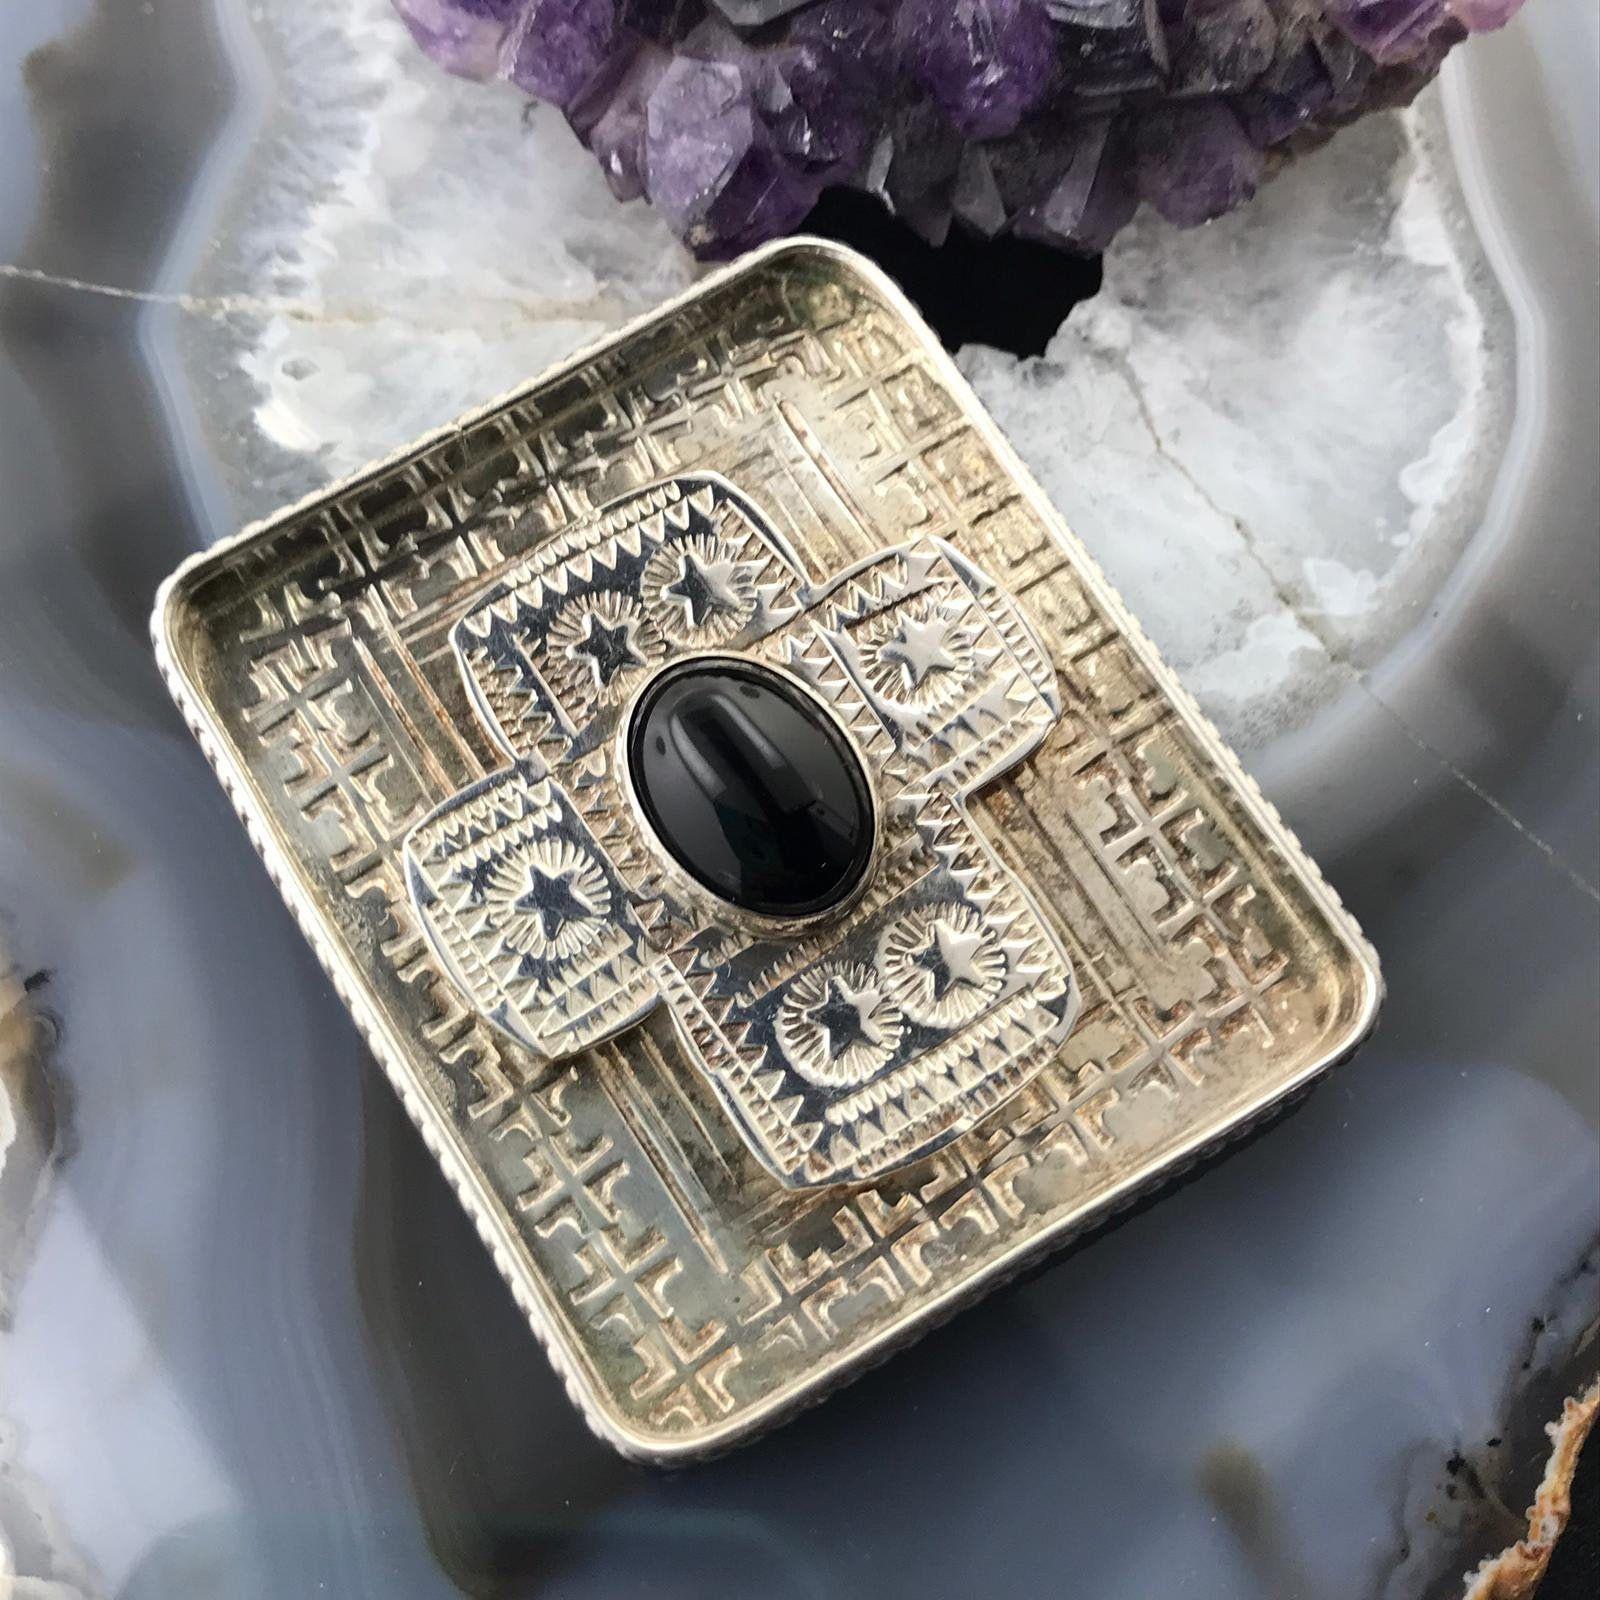 Grady Alexander Sterling Silver Oval Onyx Stamped Brooch